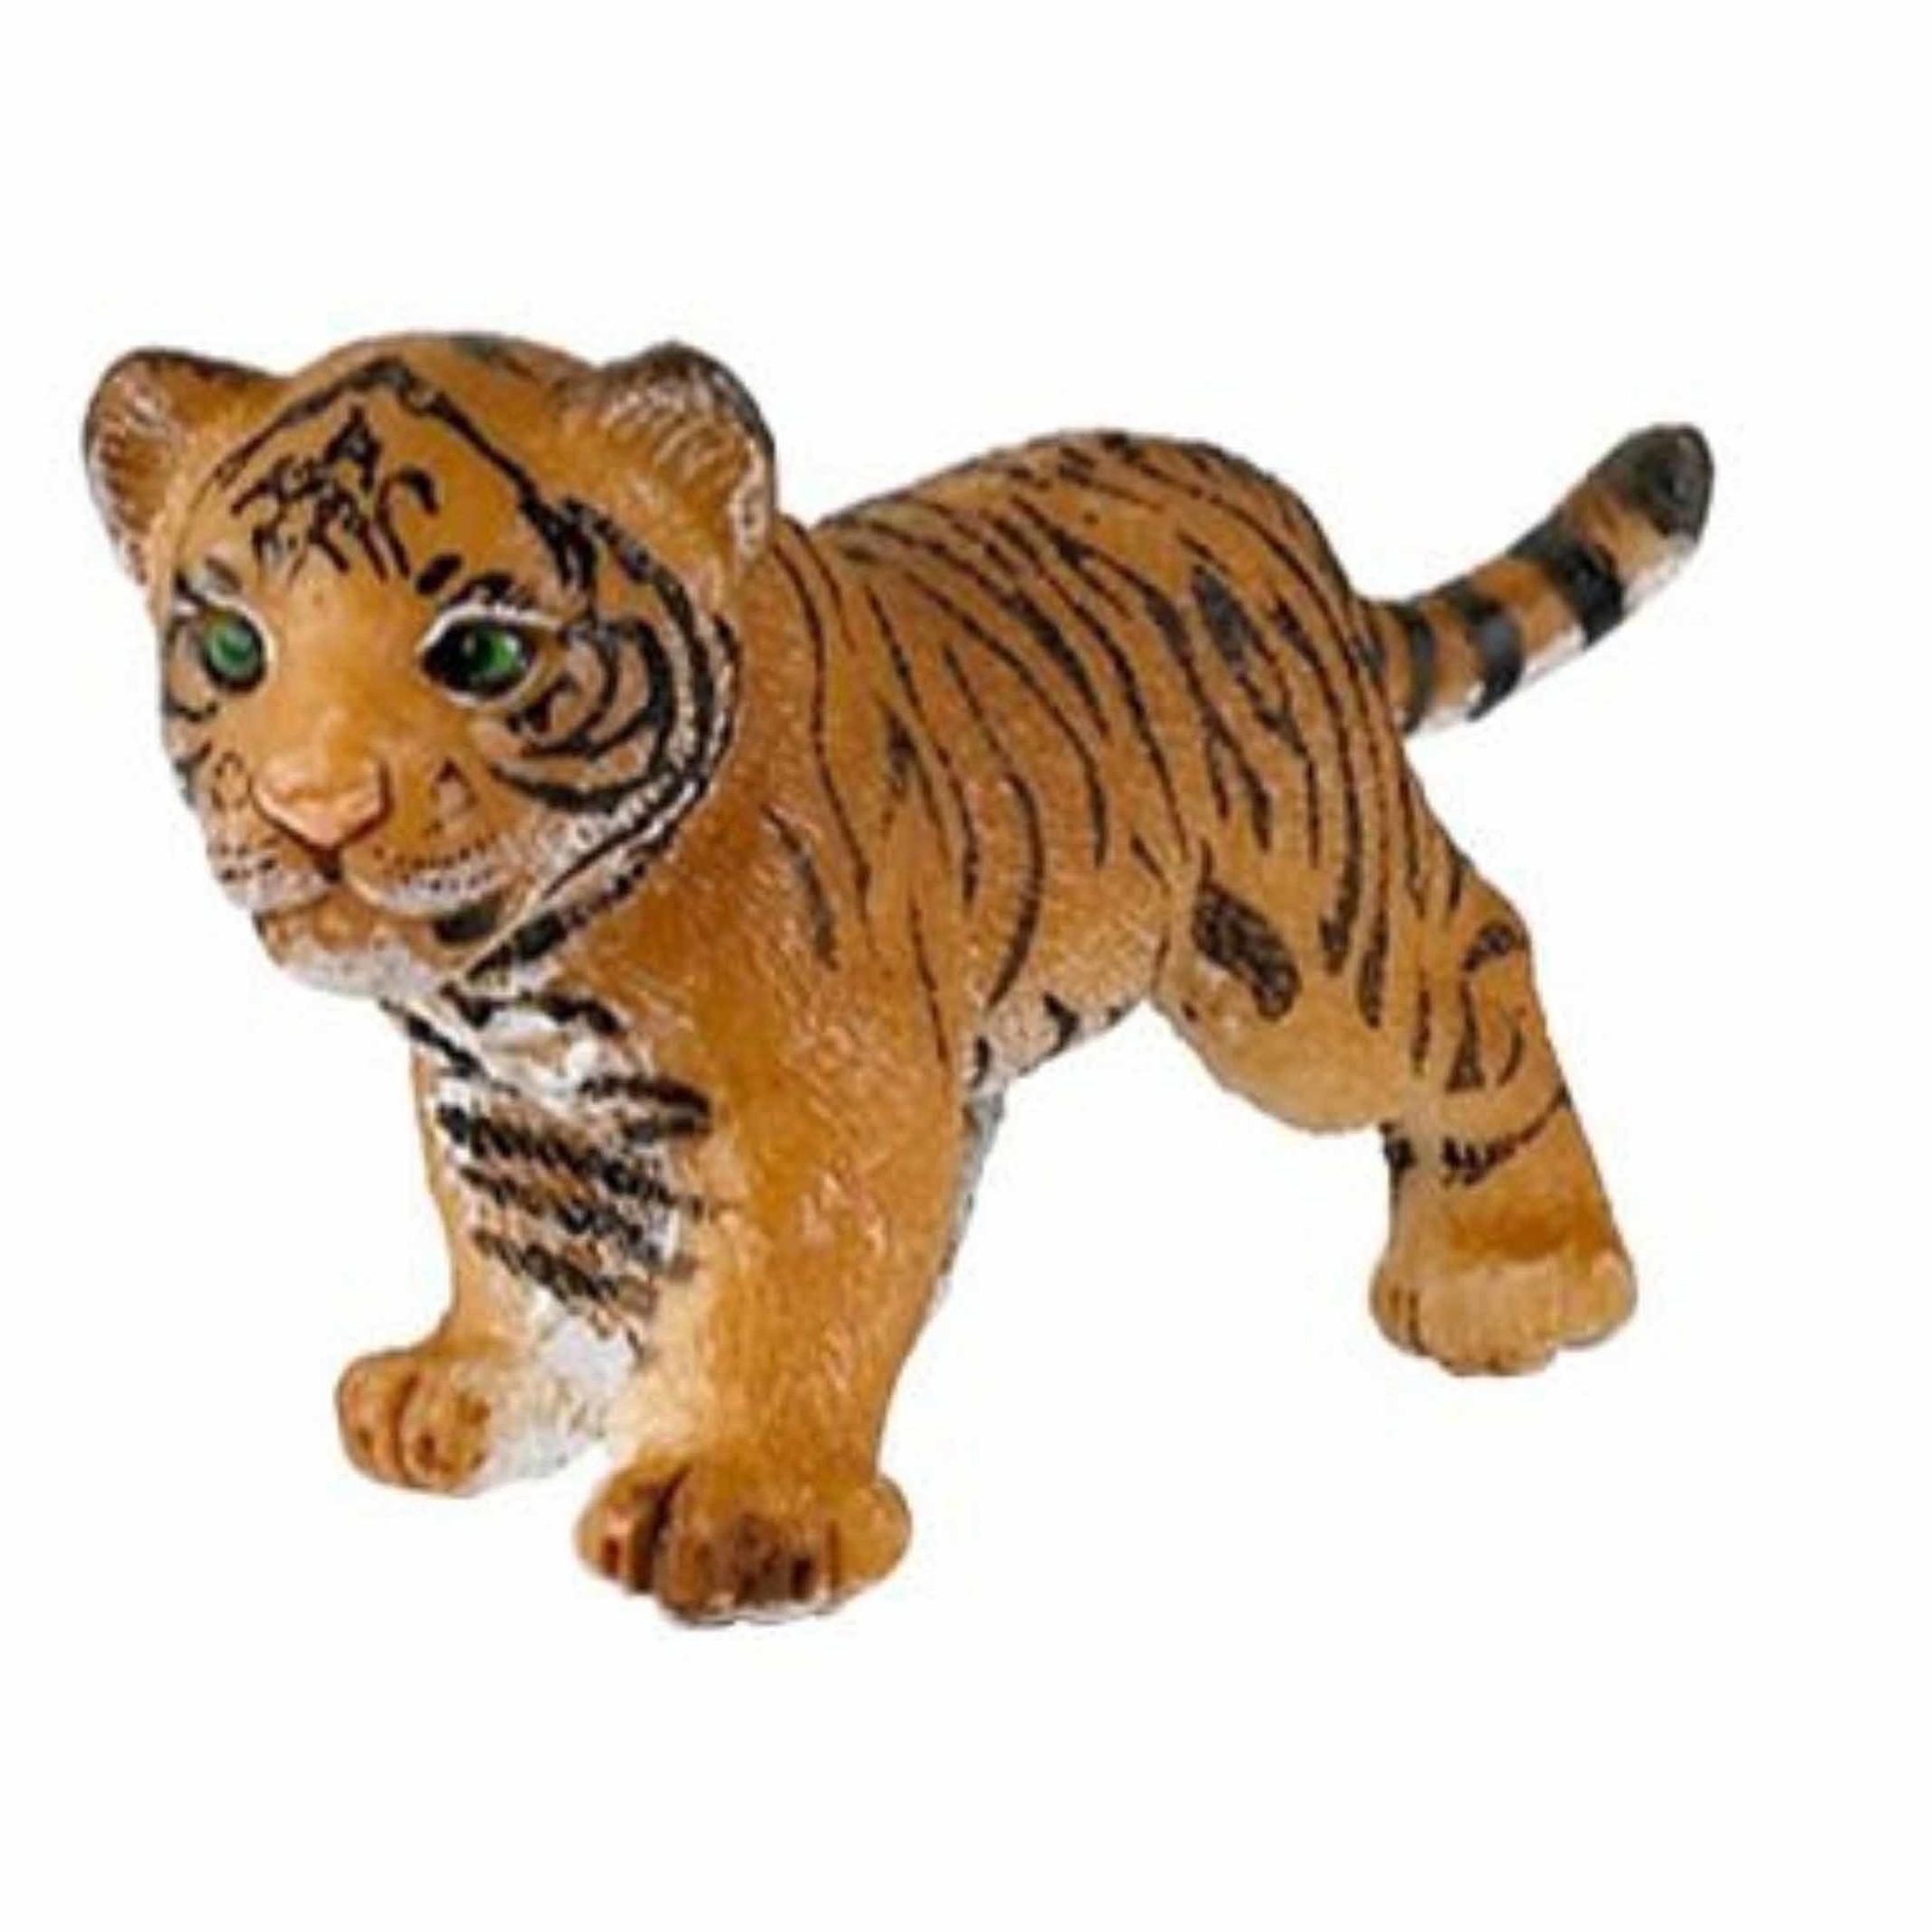 Plastic speelgoed tijgertje 4 cm